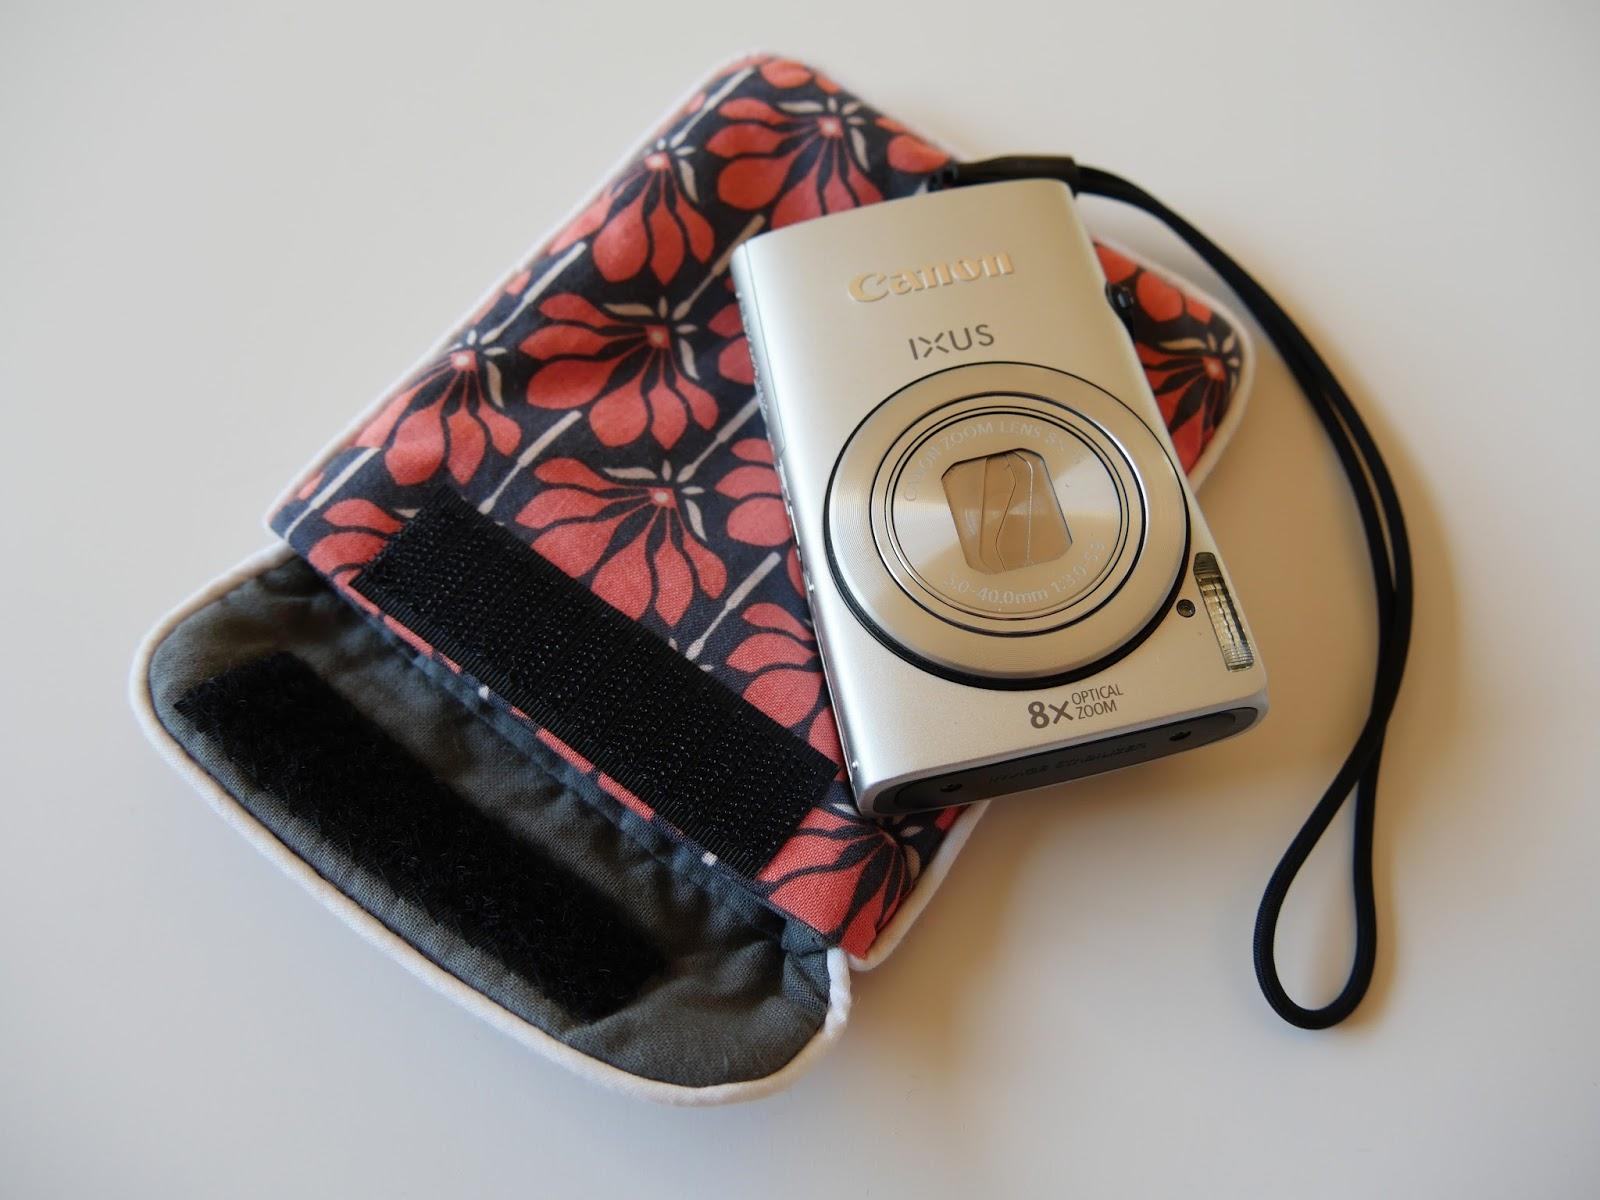 Tadaam housse pour appareil photo for Housse appareil photo